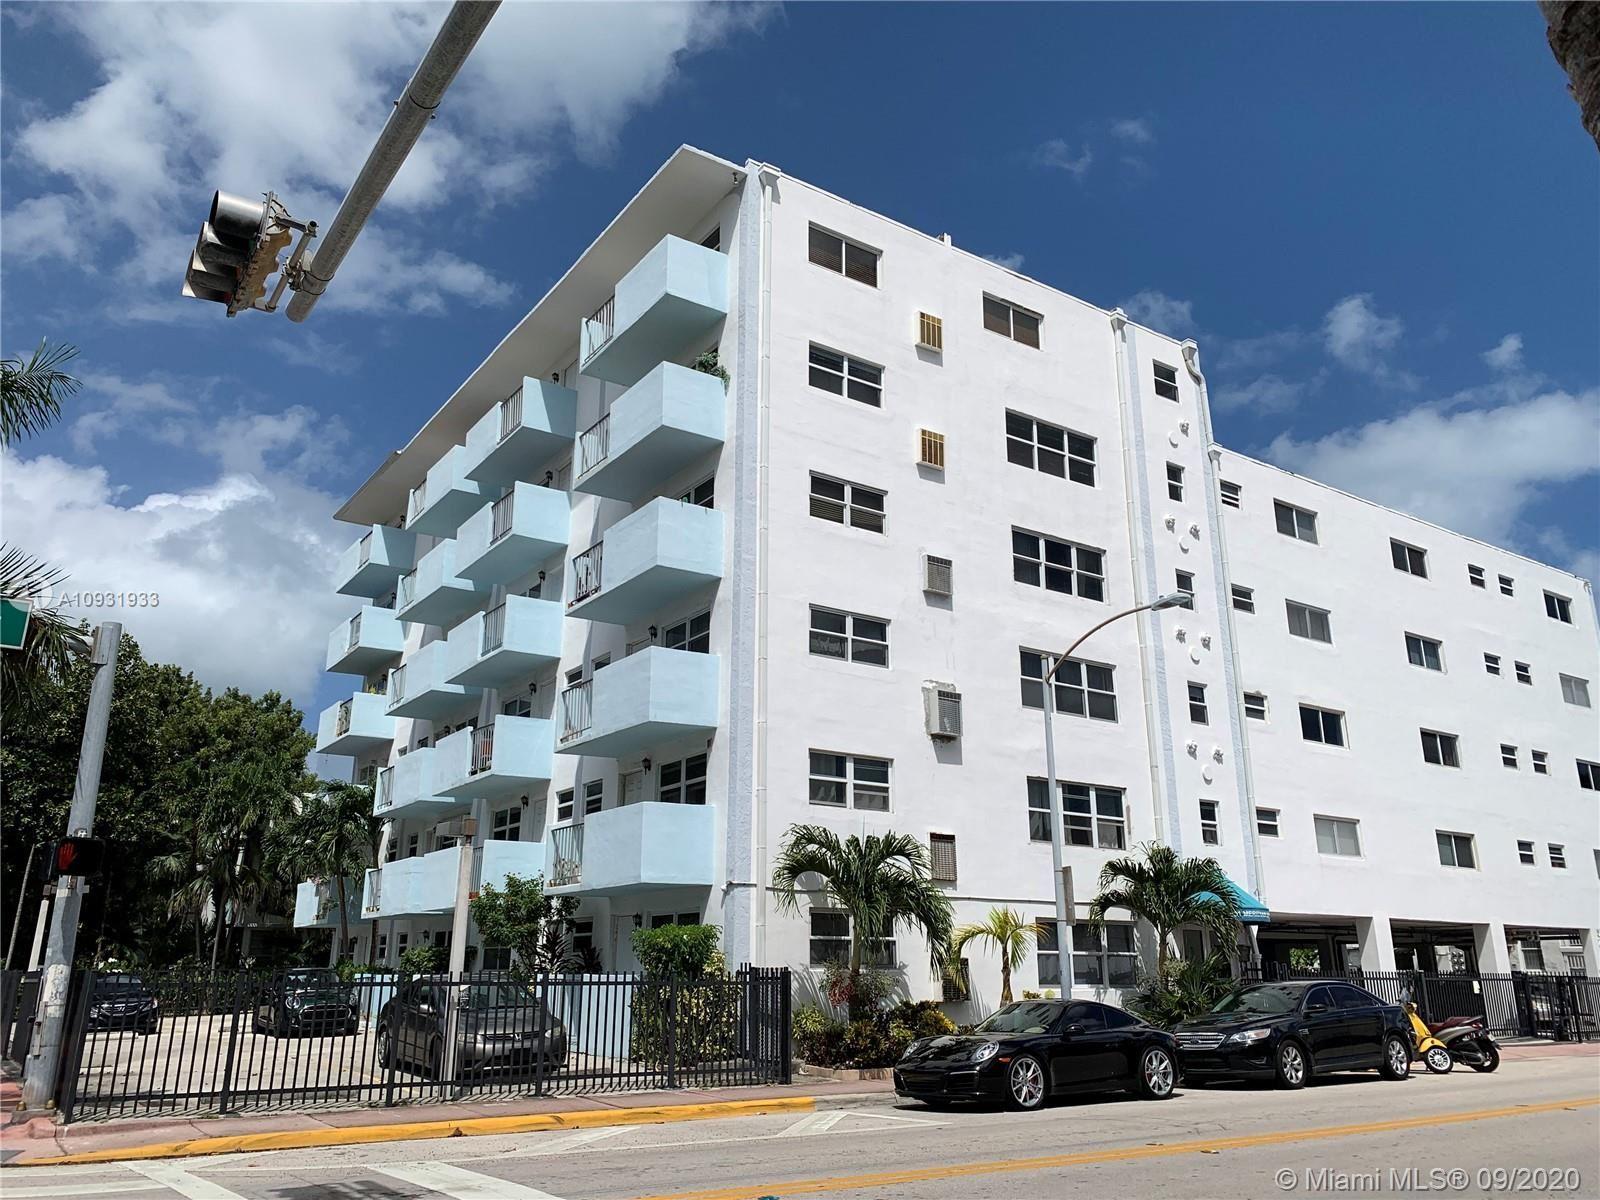 801 Meridian Ave #PHA, Miami Beach, FL 33139 - #: A10931933